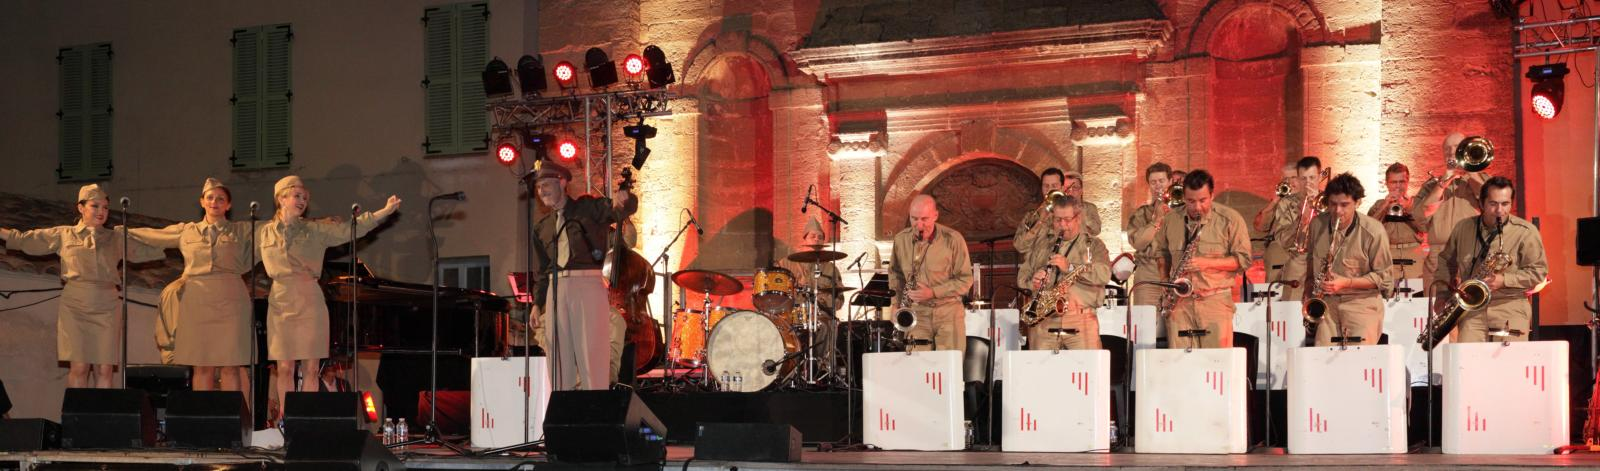 Concert Glenn Ambassadors in Pertuis in Pertuis